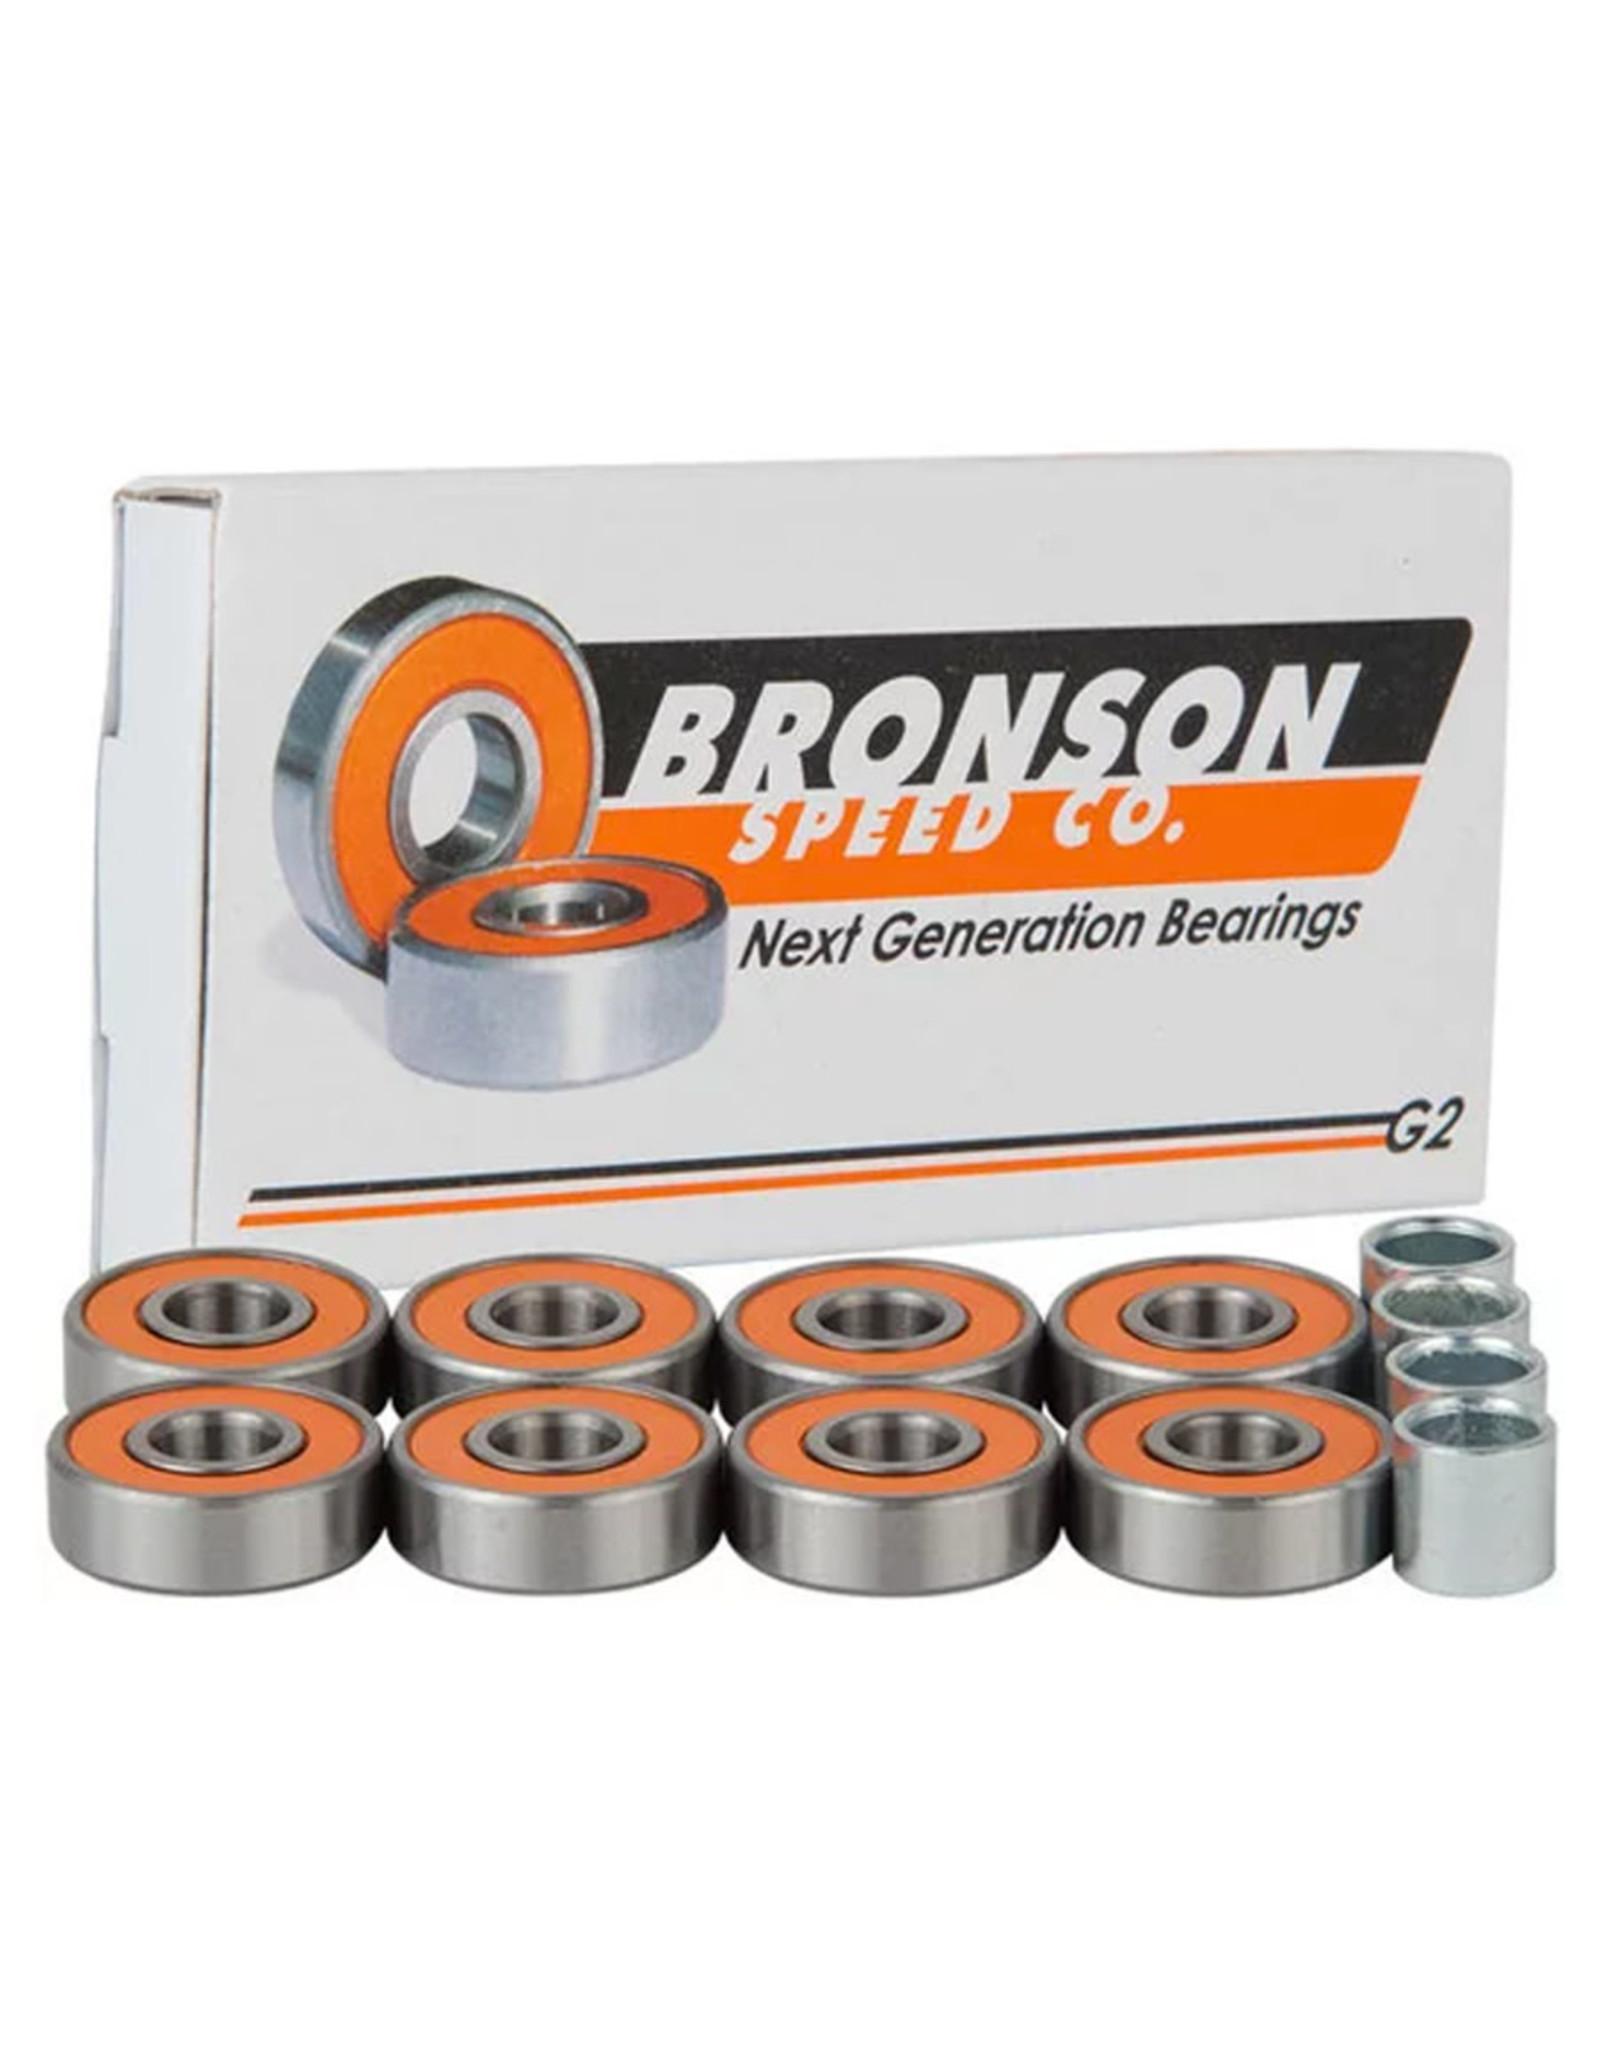 Bronson Speed Co. Bronson Bearings G2